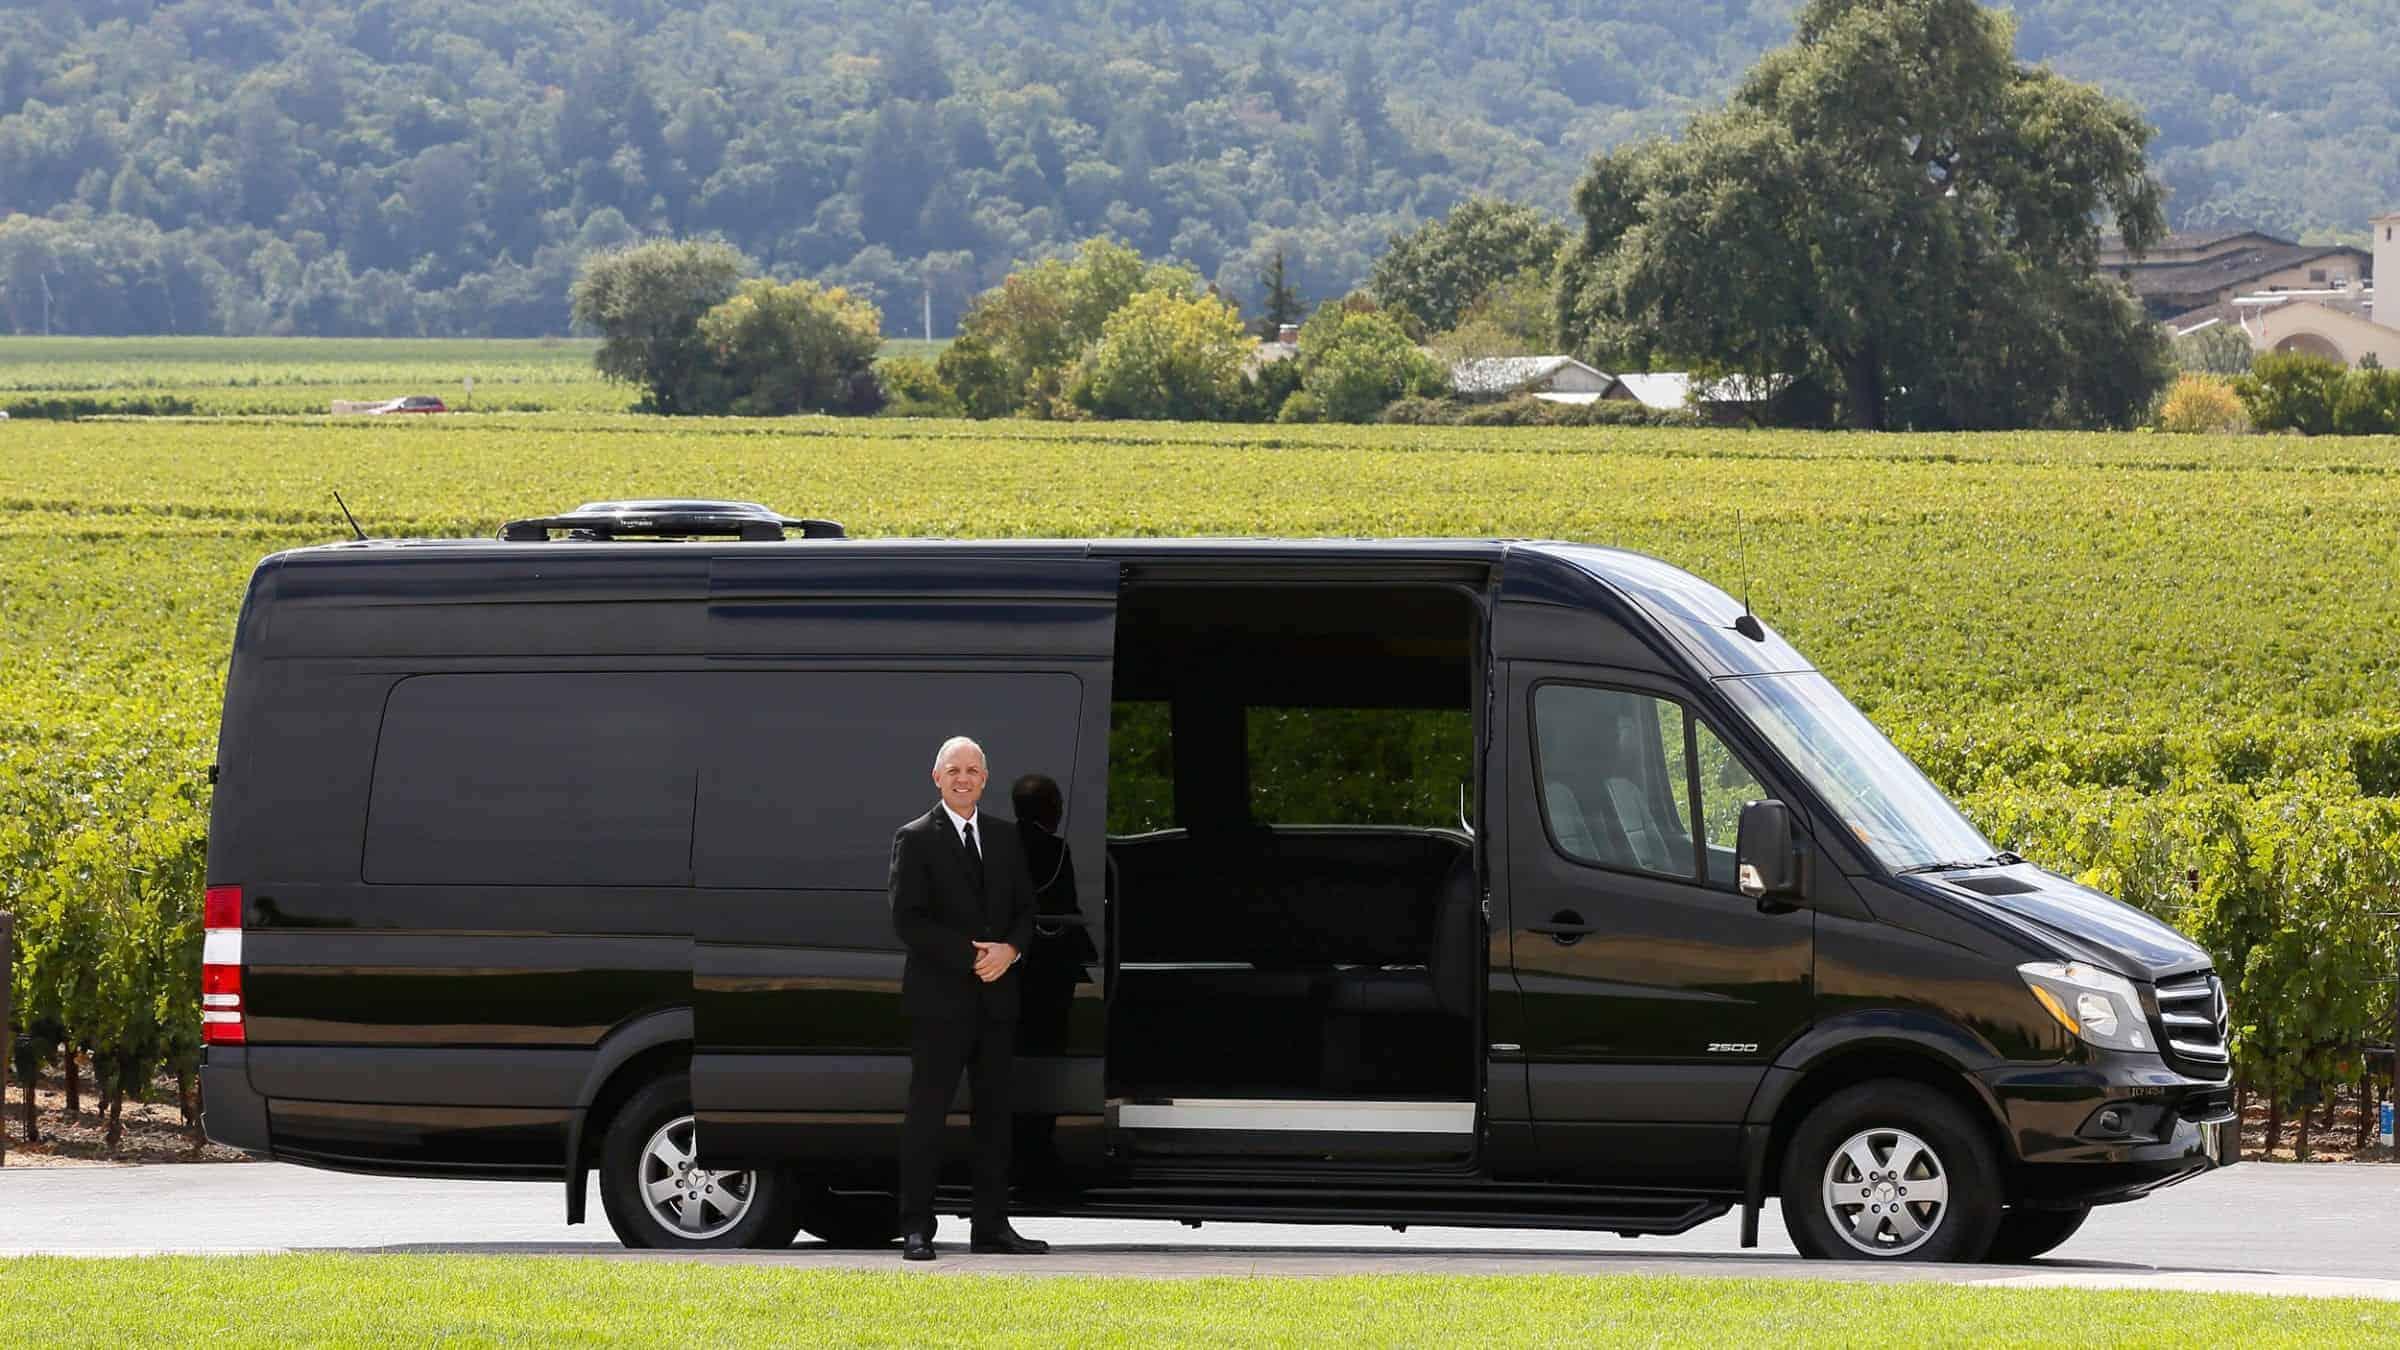 Beau Wine Tours and Limousine Service